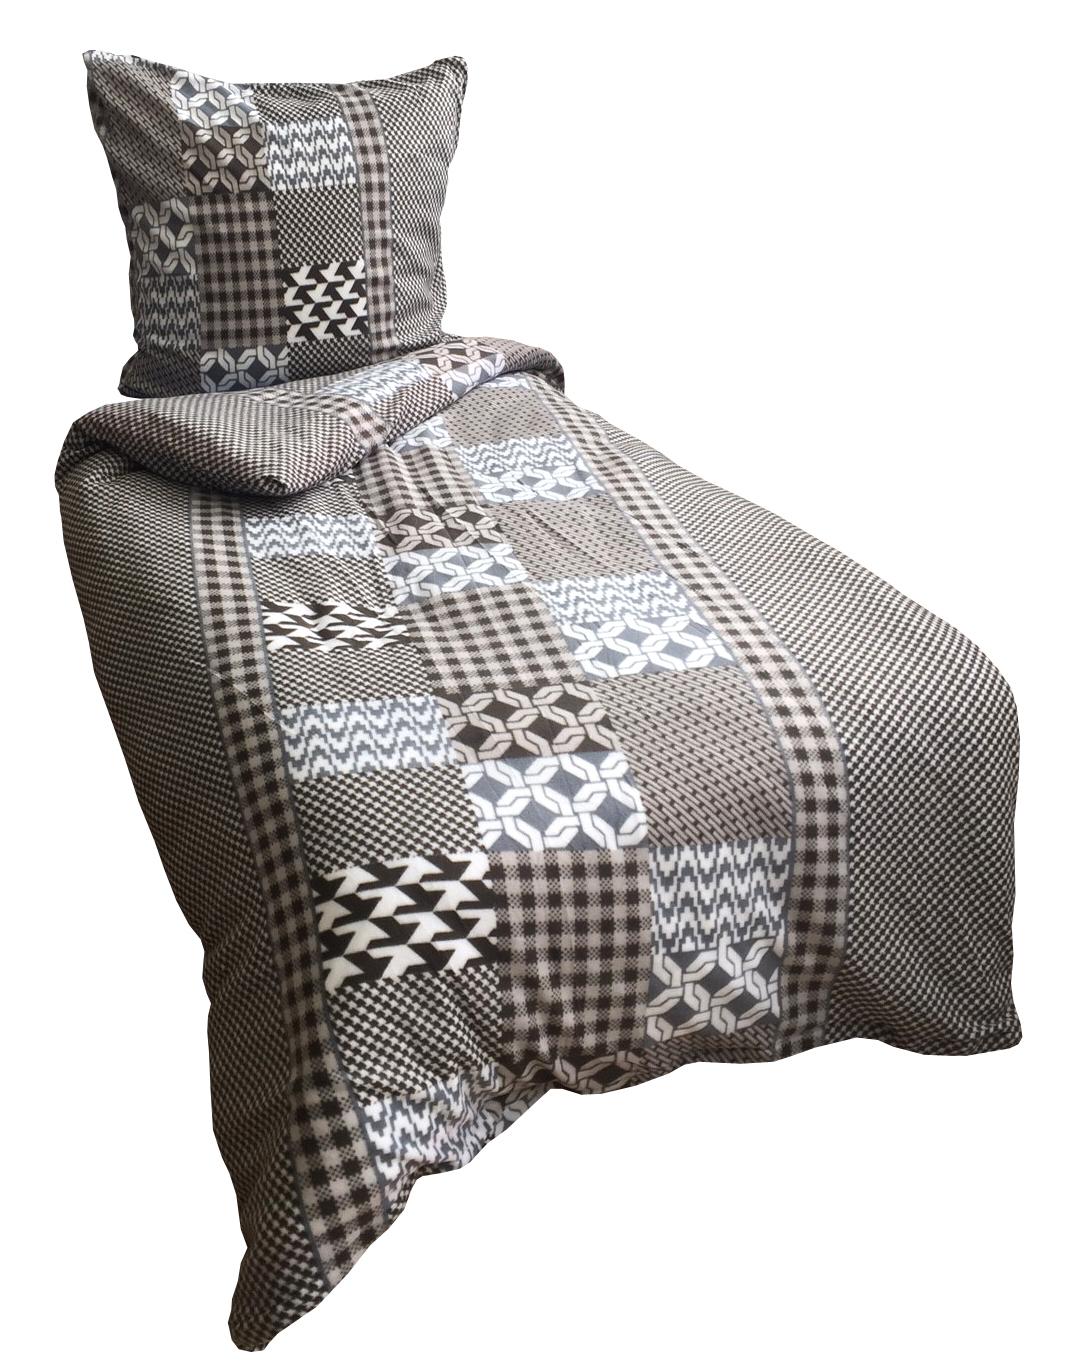 2 tlg thermofleece bettw sche 135x200 cm grau wei. Black Bedroom Furniture Sets. Home Design Ideas